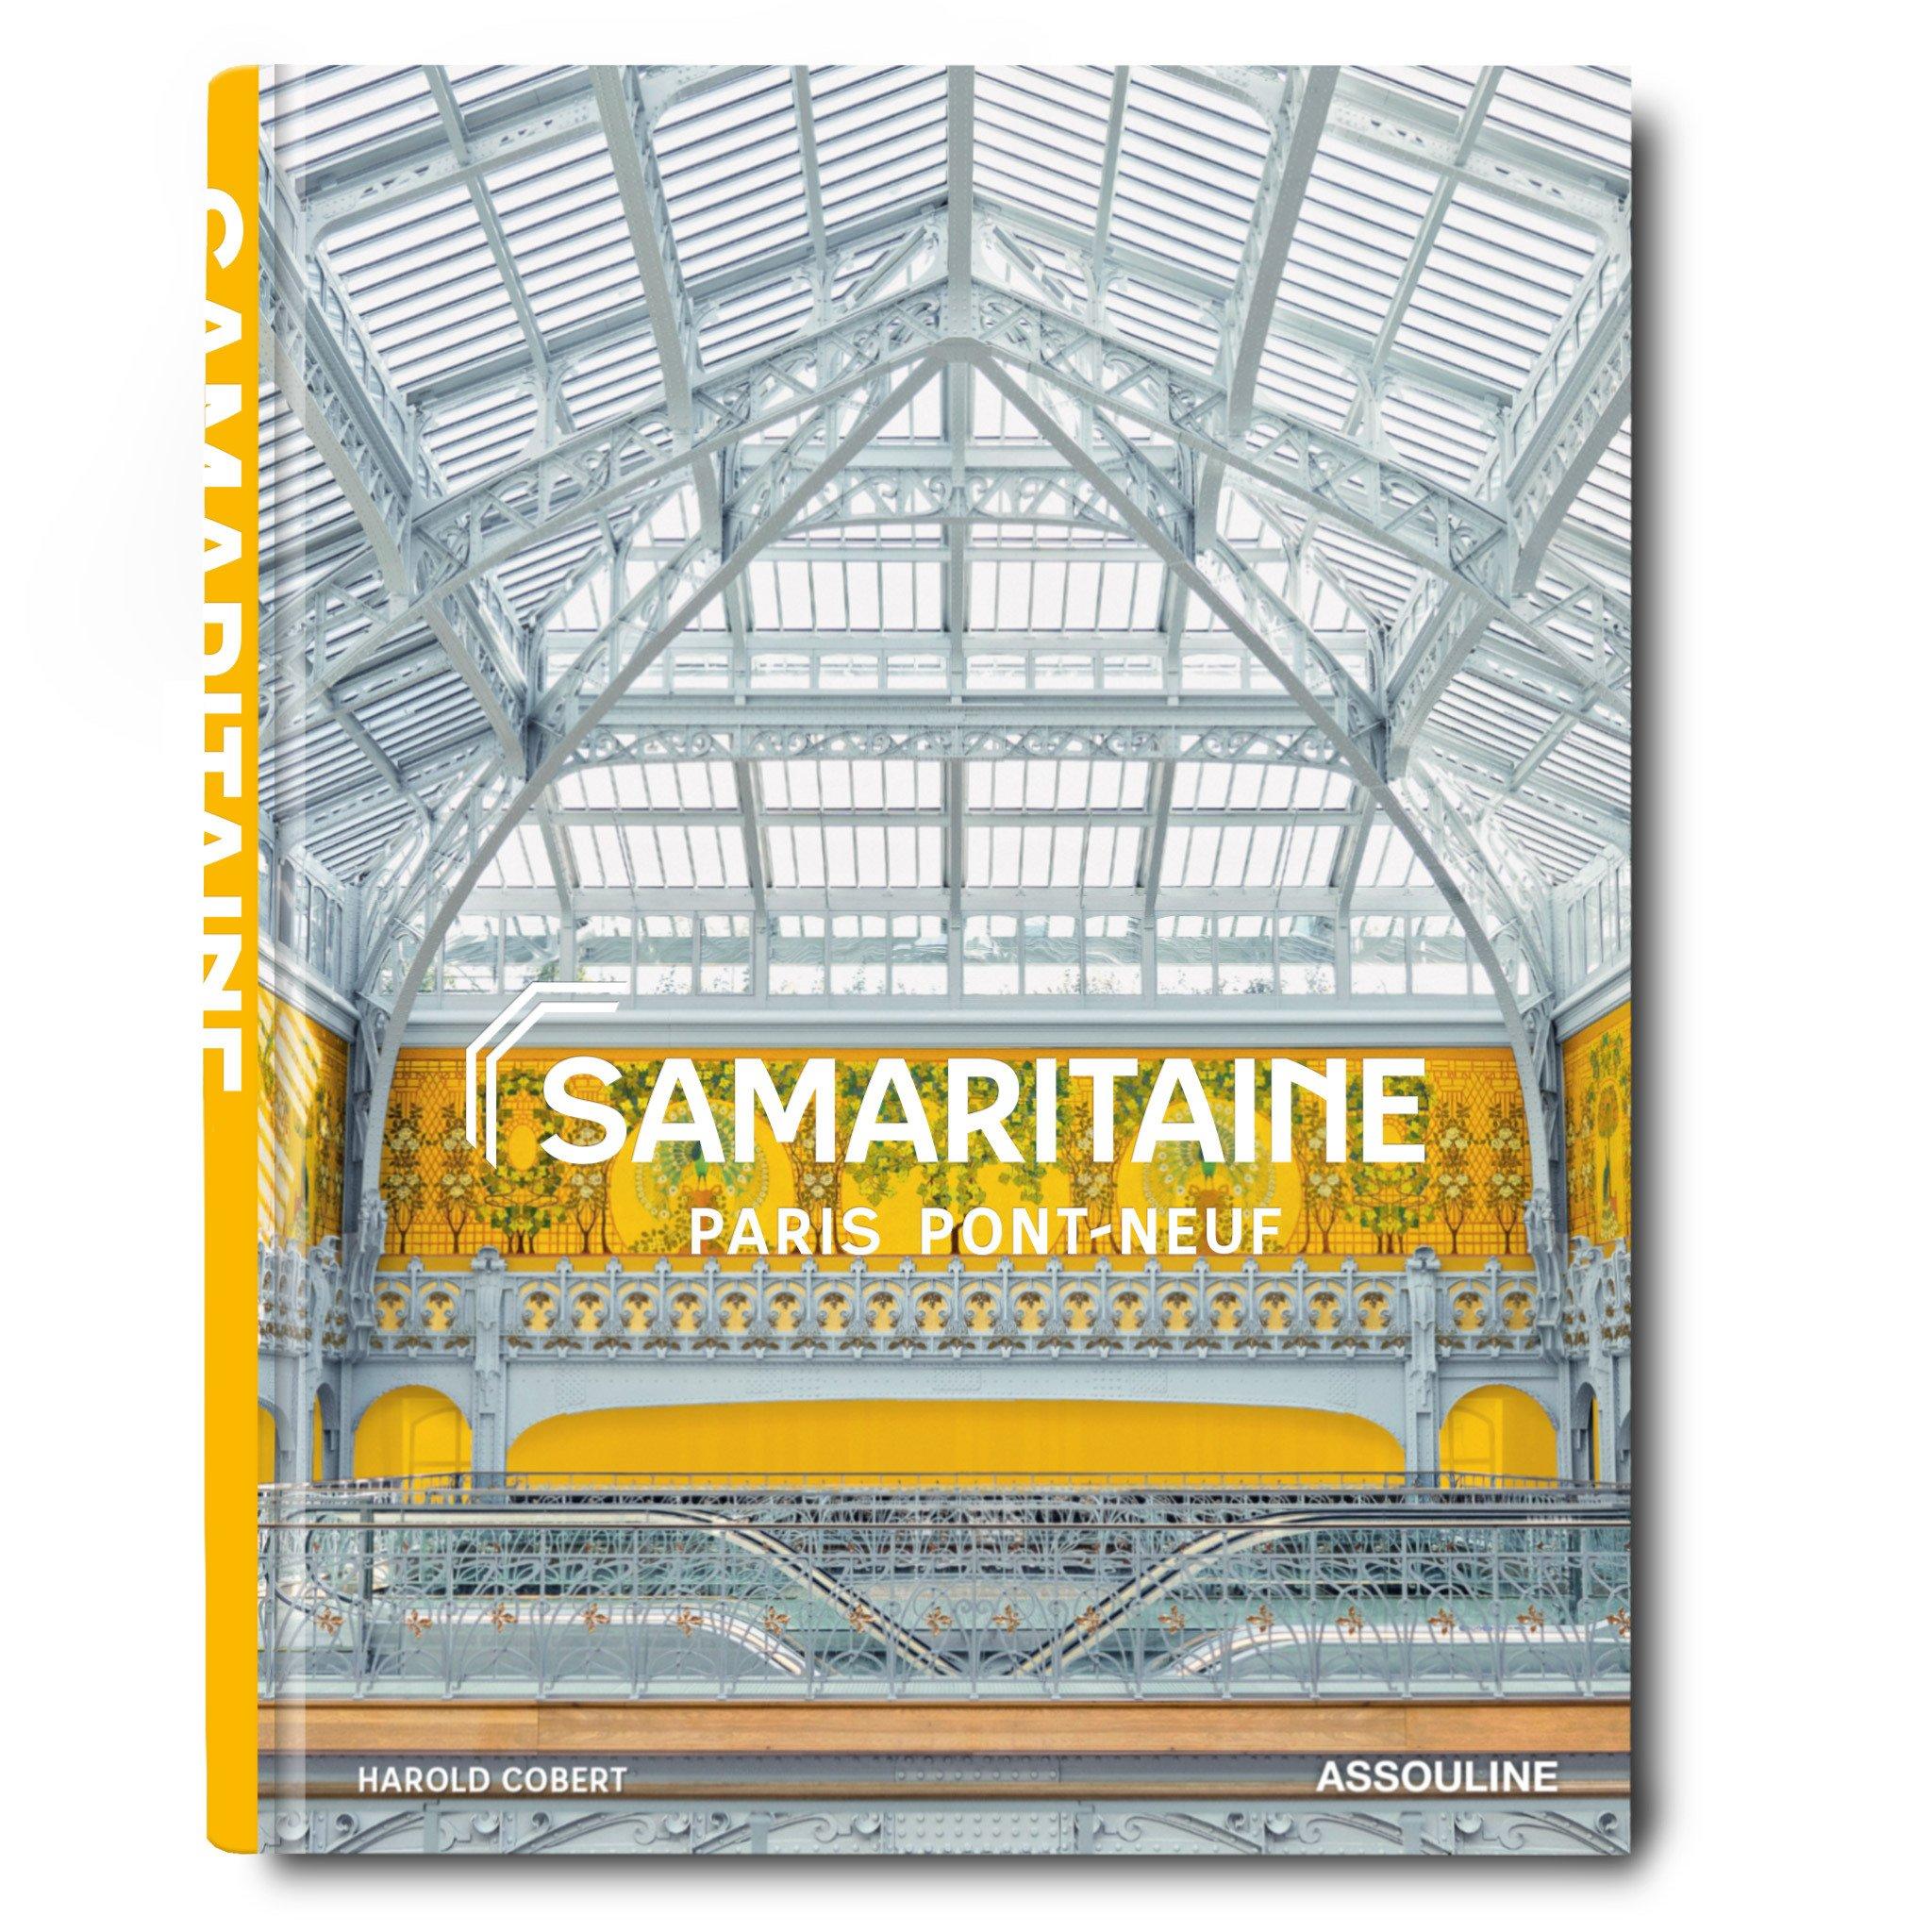 Samaritaine: Paris Pont-Neuf Book assouline